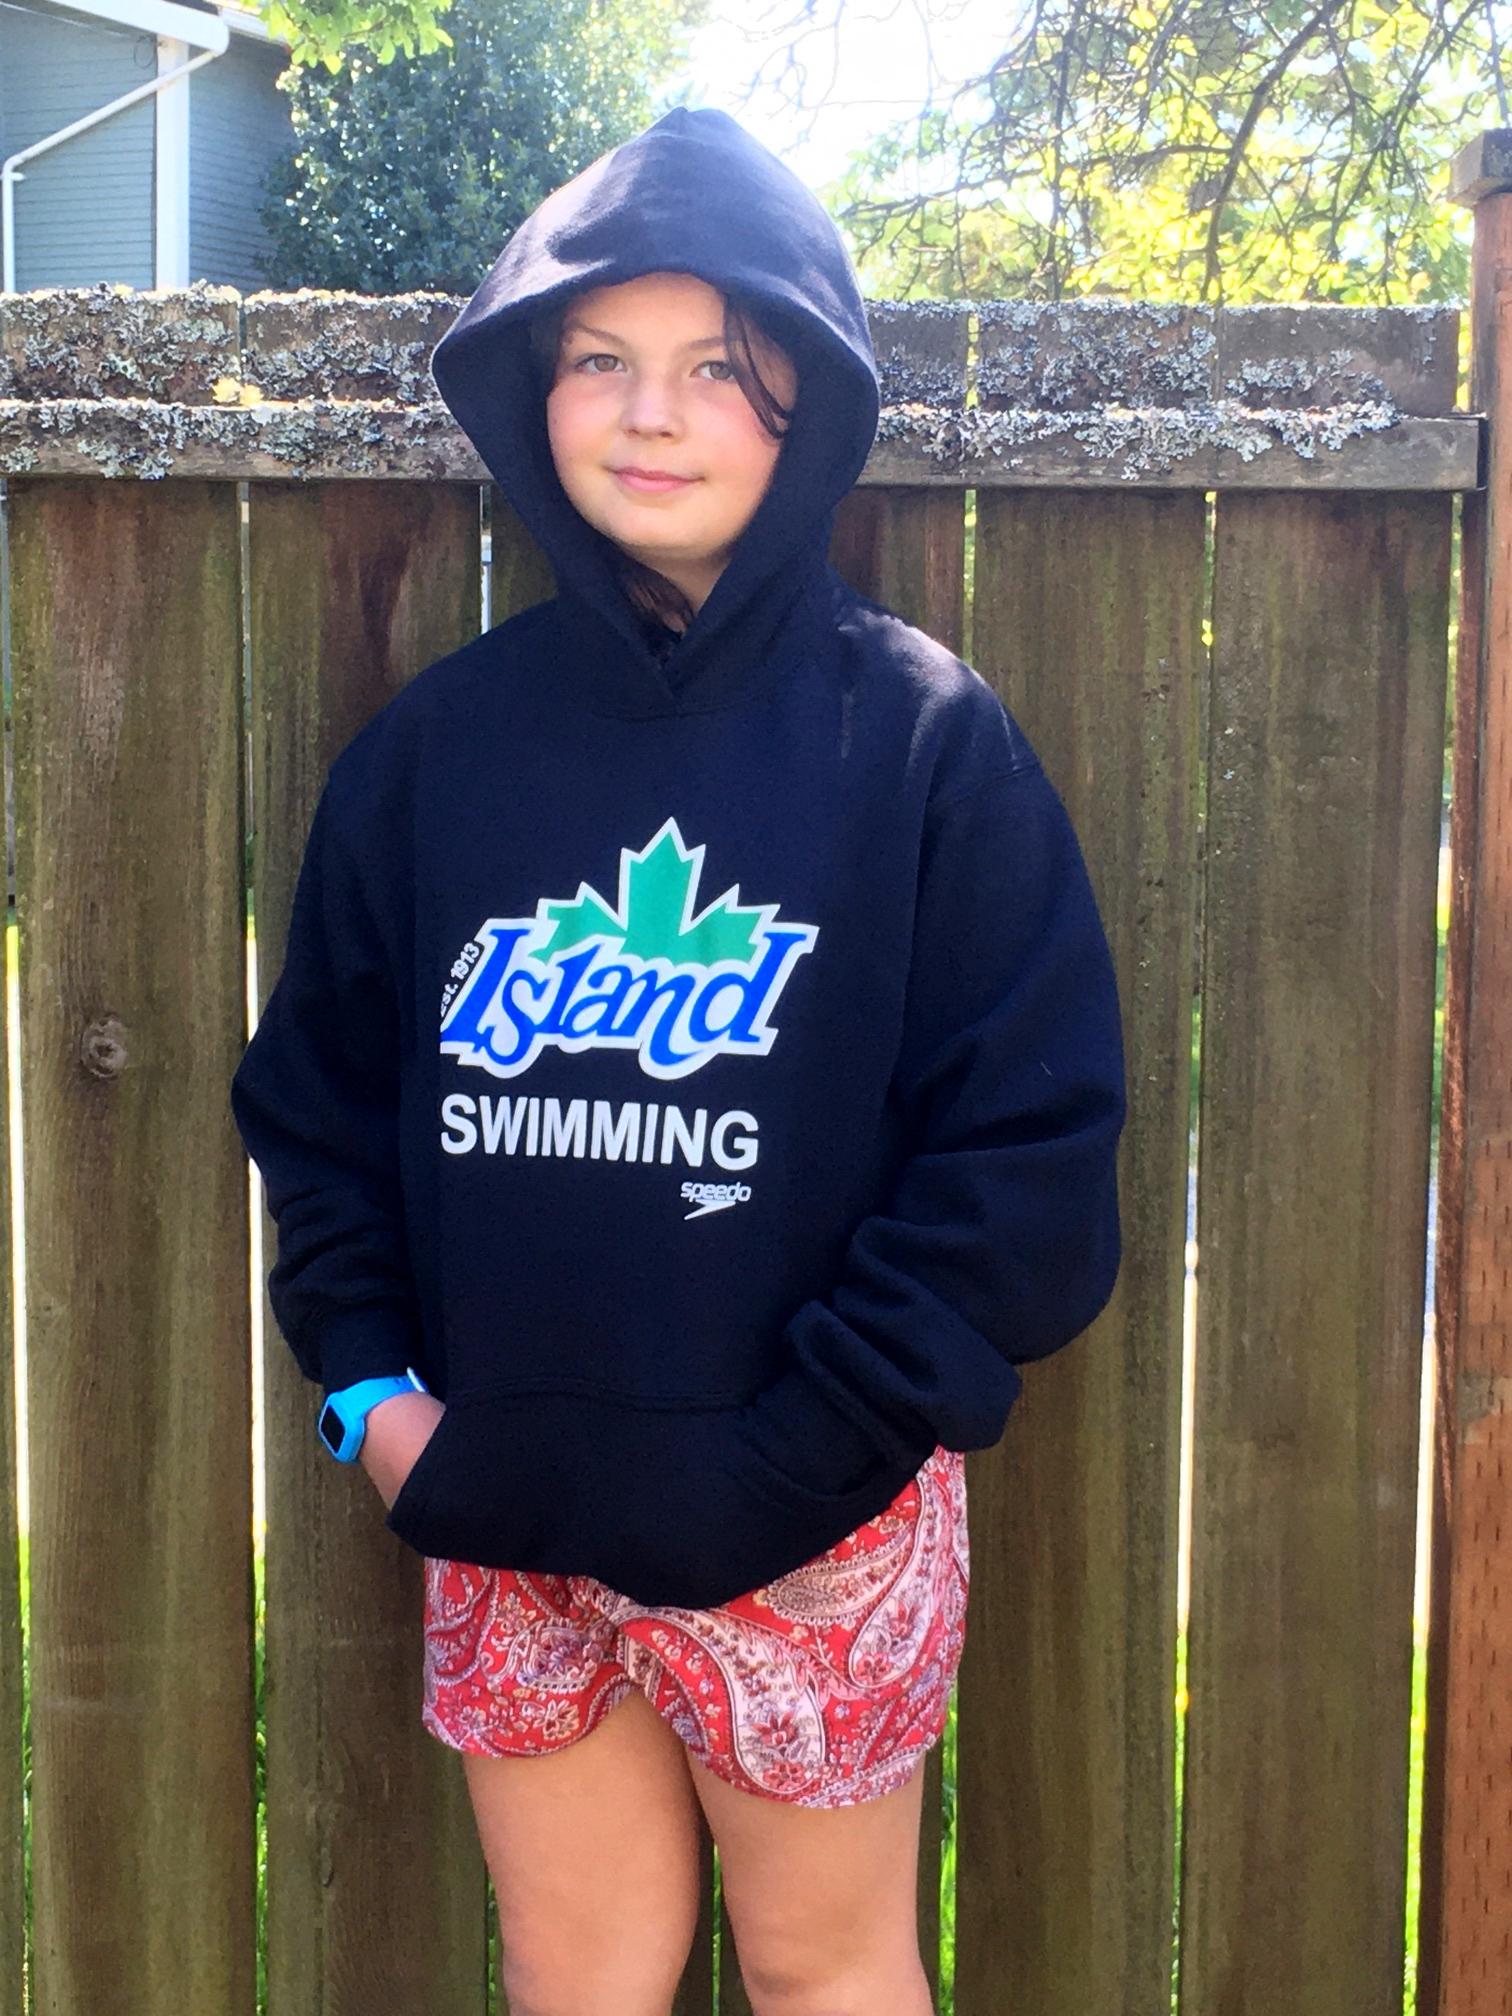 Black Island Swimming Hooded Sweatshirt with colour logo